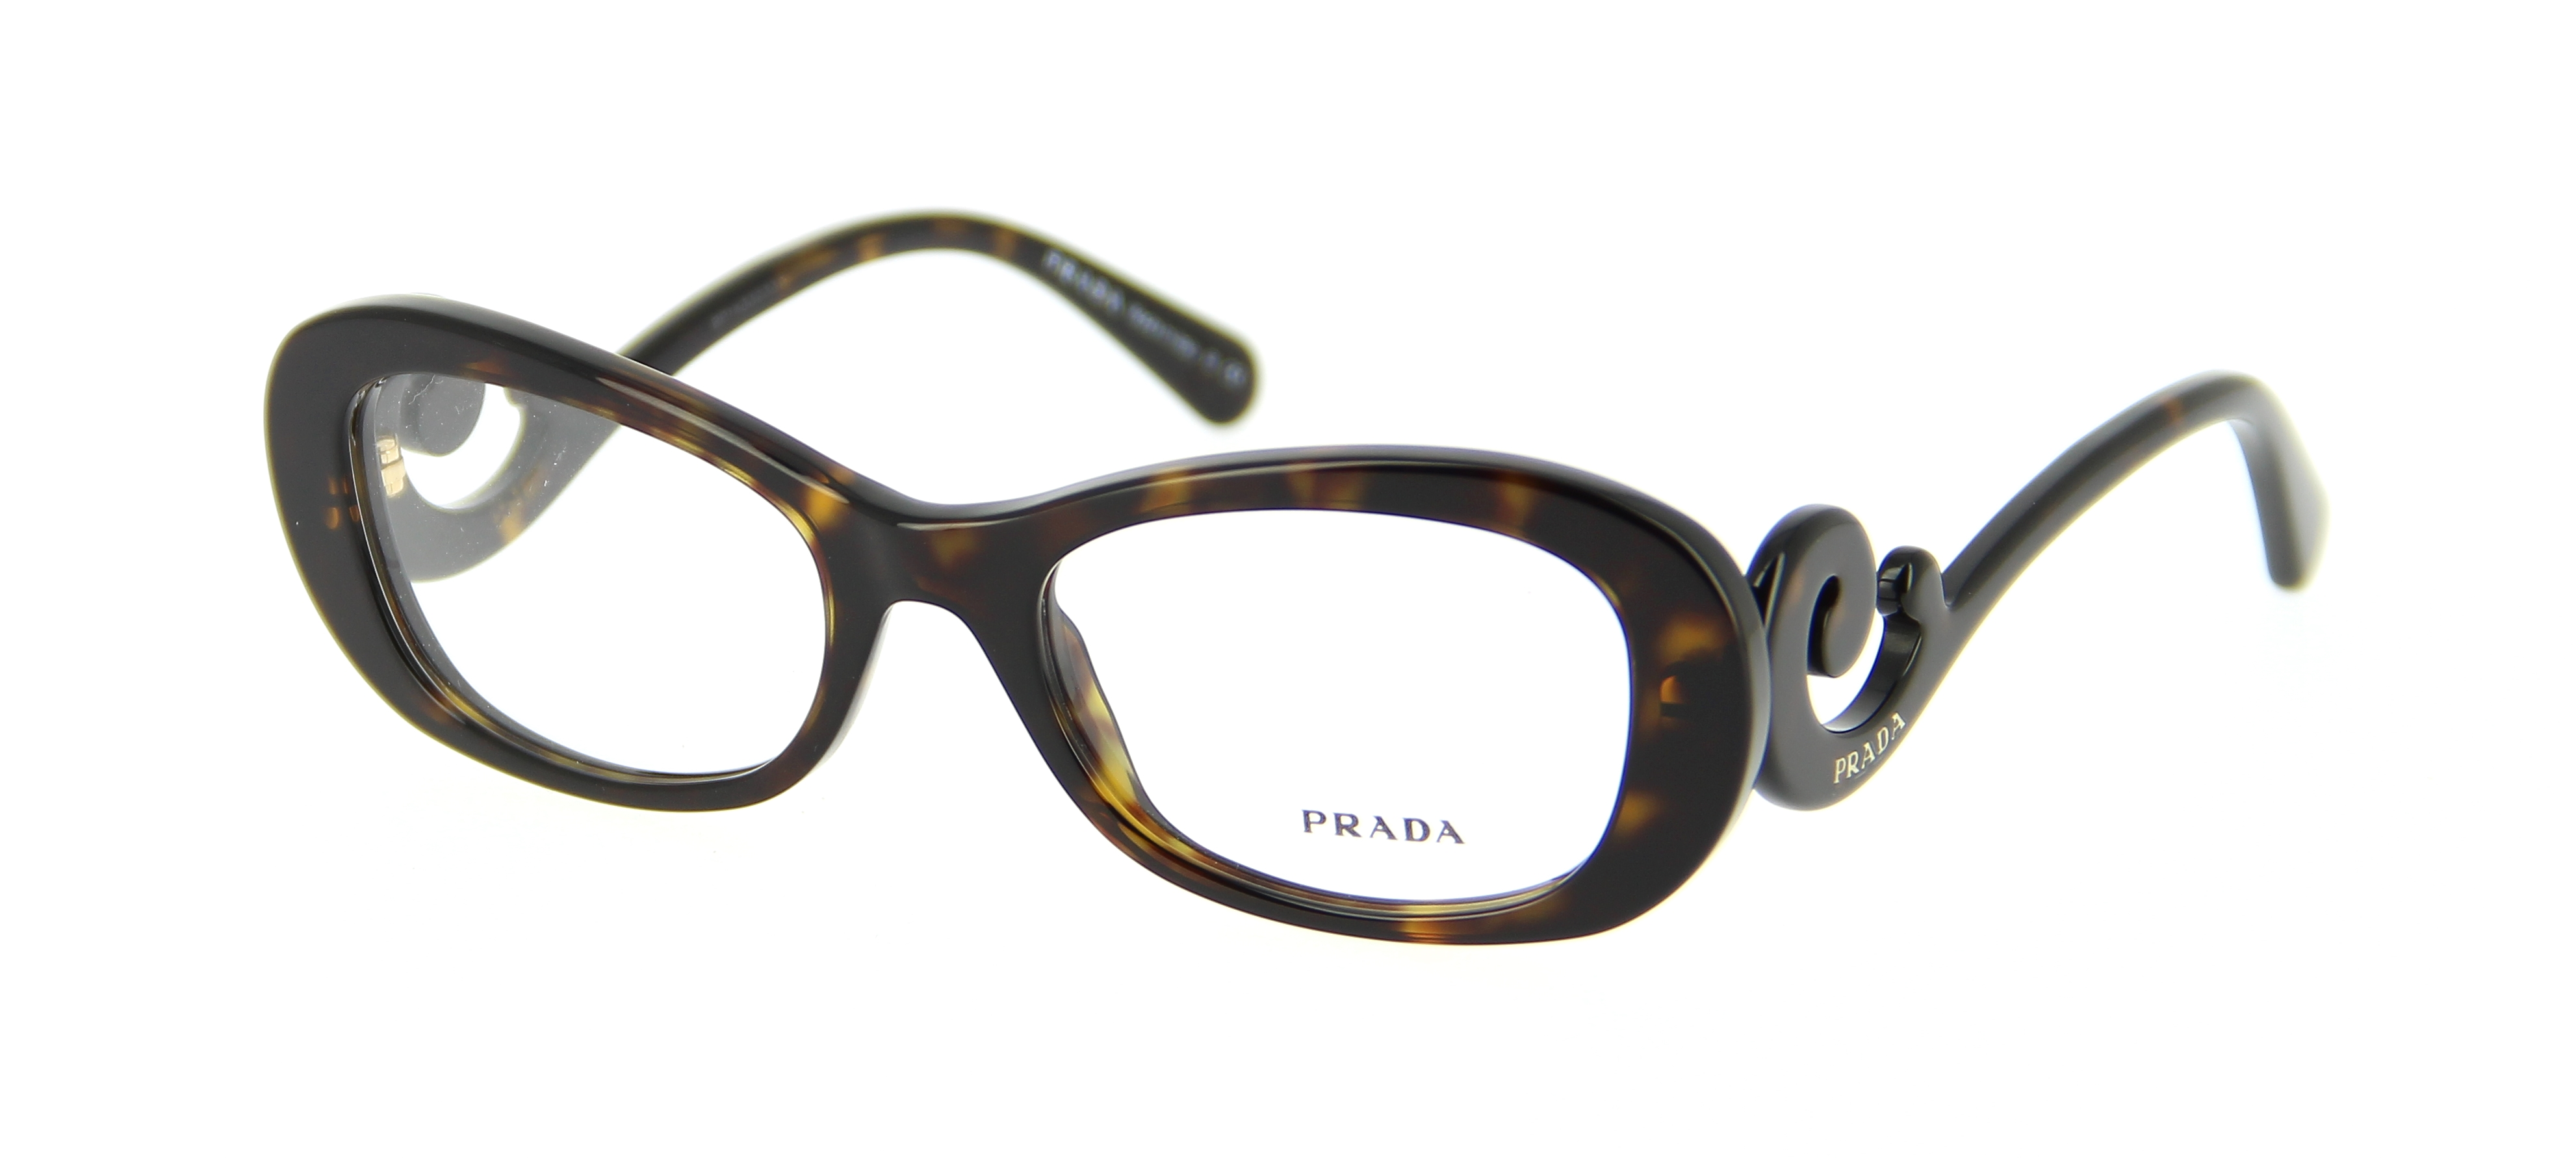 Monture prada lunette de vue louisiana bucket brigade for Miroir virtuel lunettes